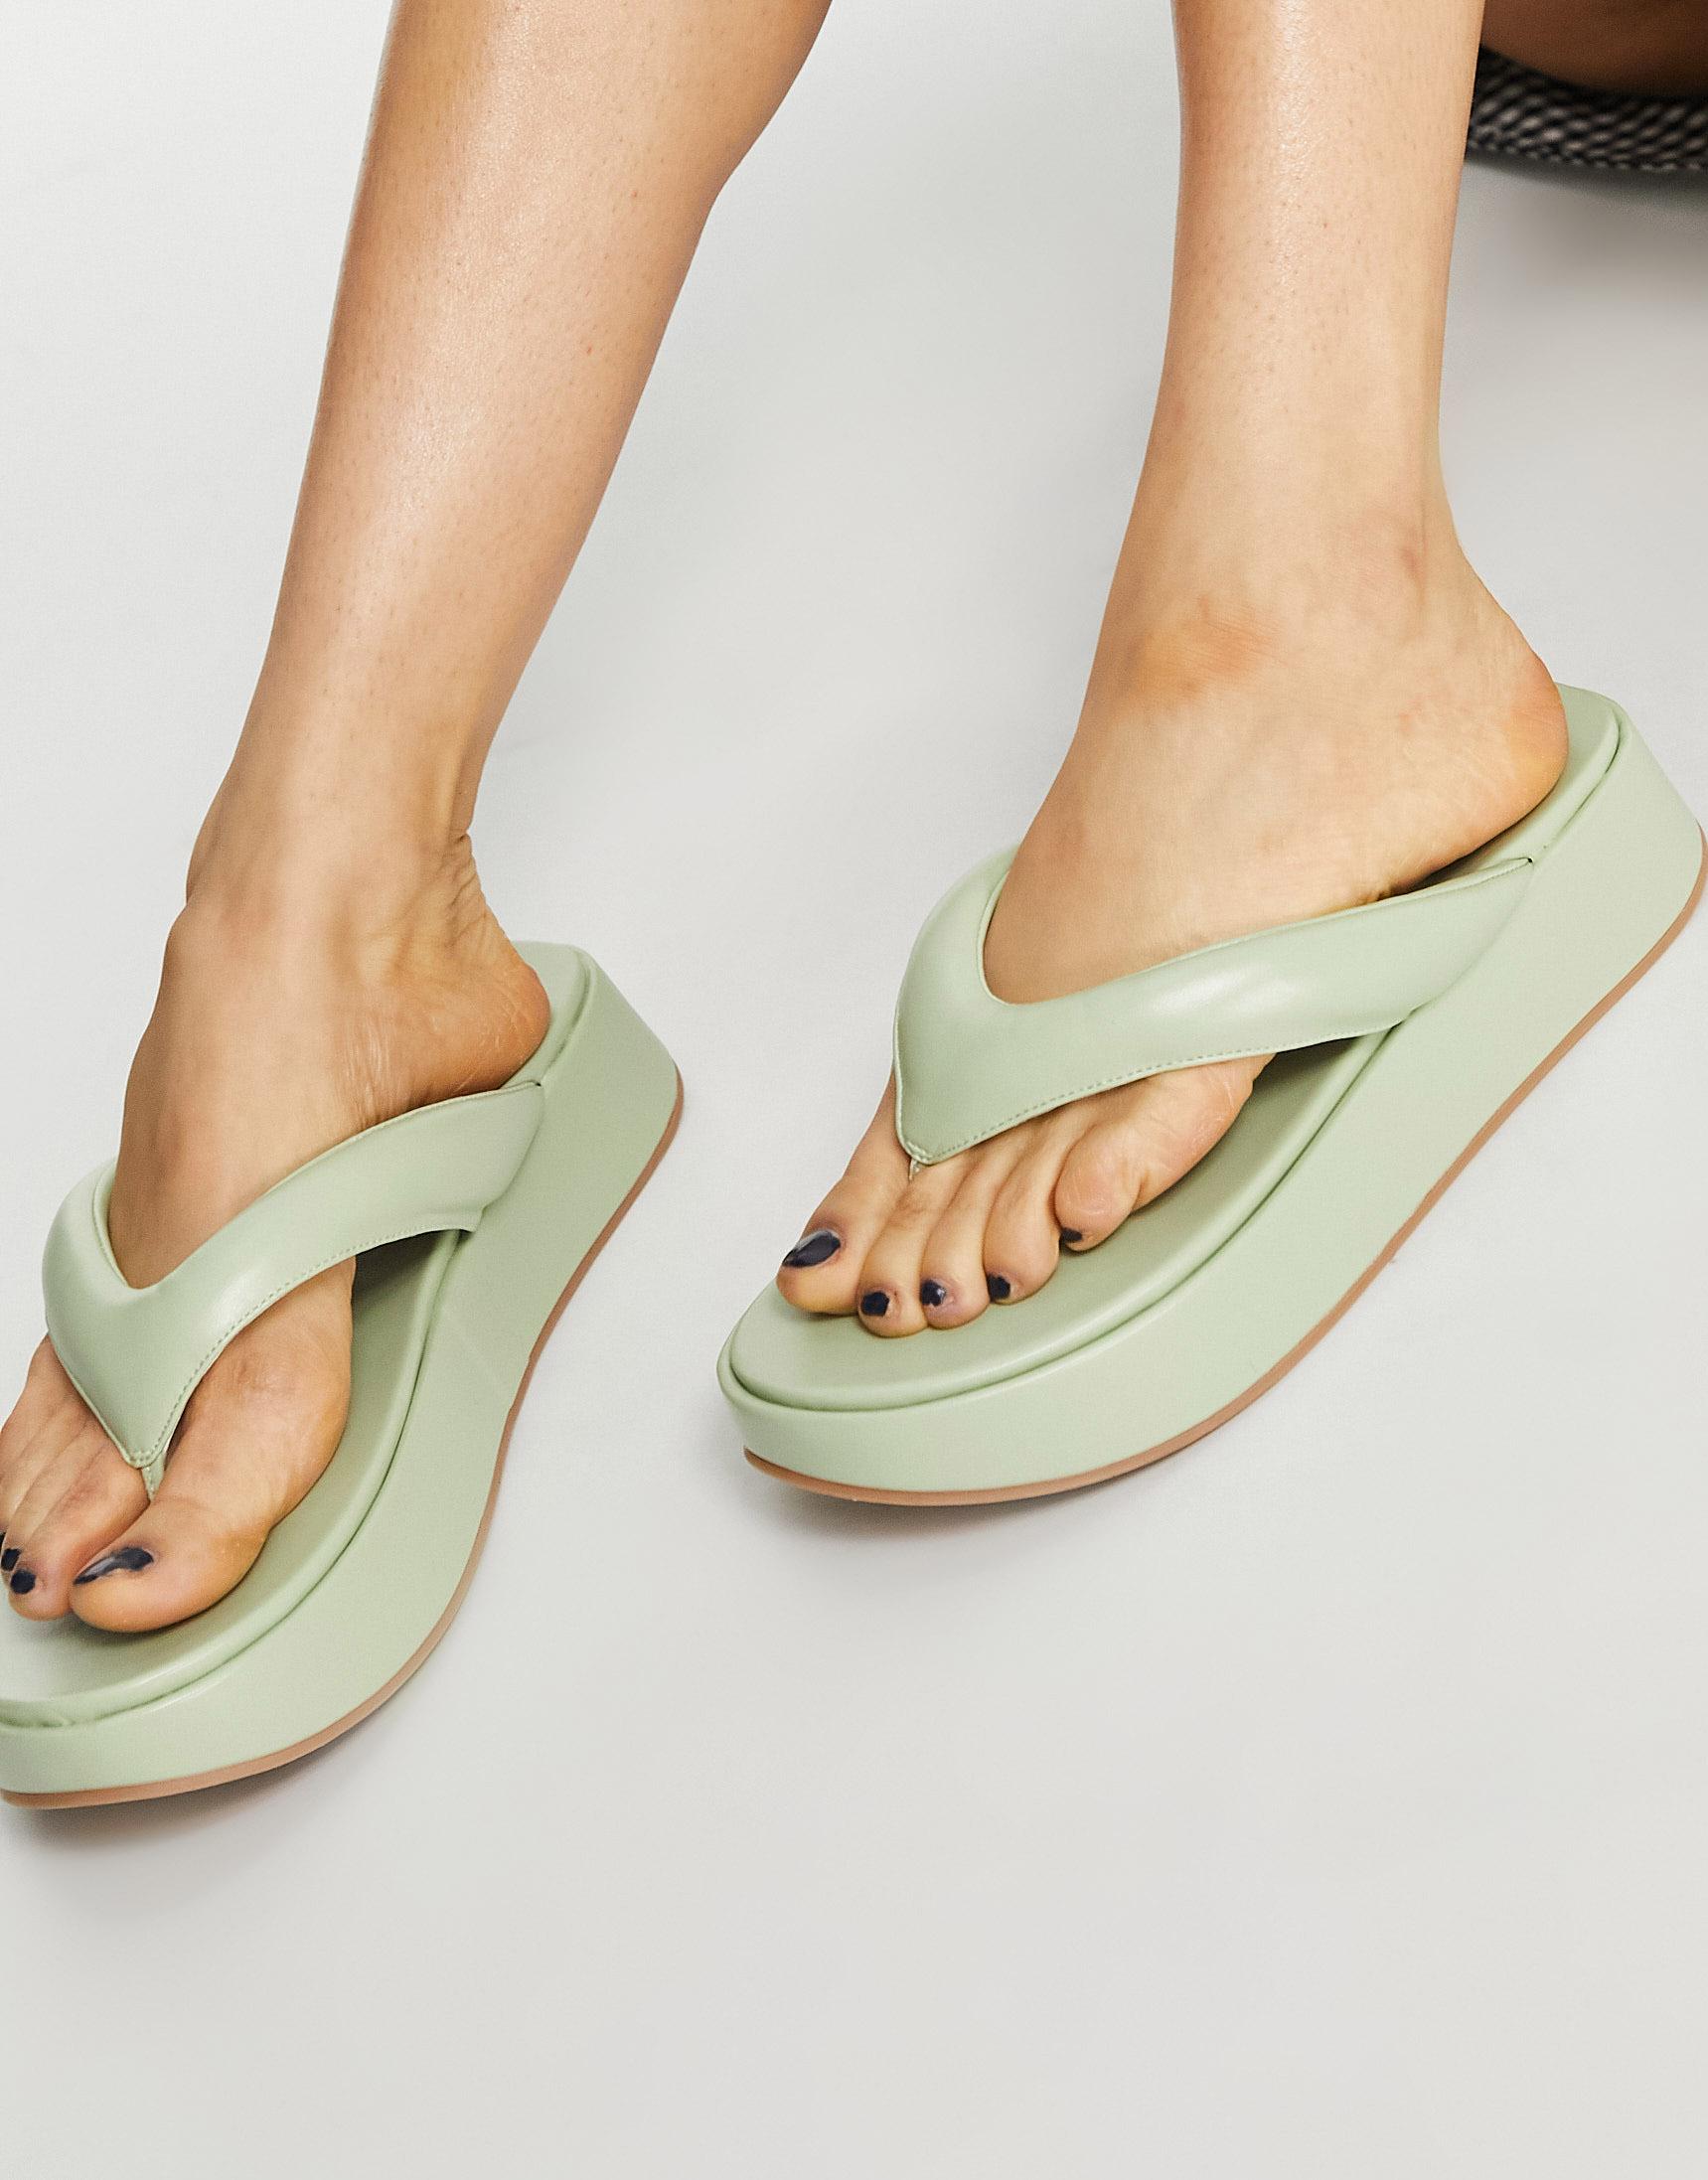 Sandalias de dedo rosas o verdes con suela gruesa